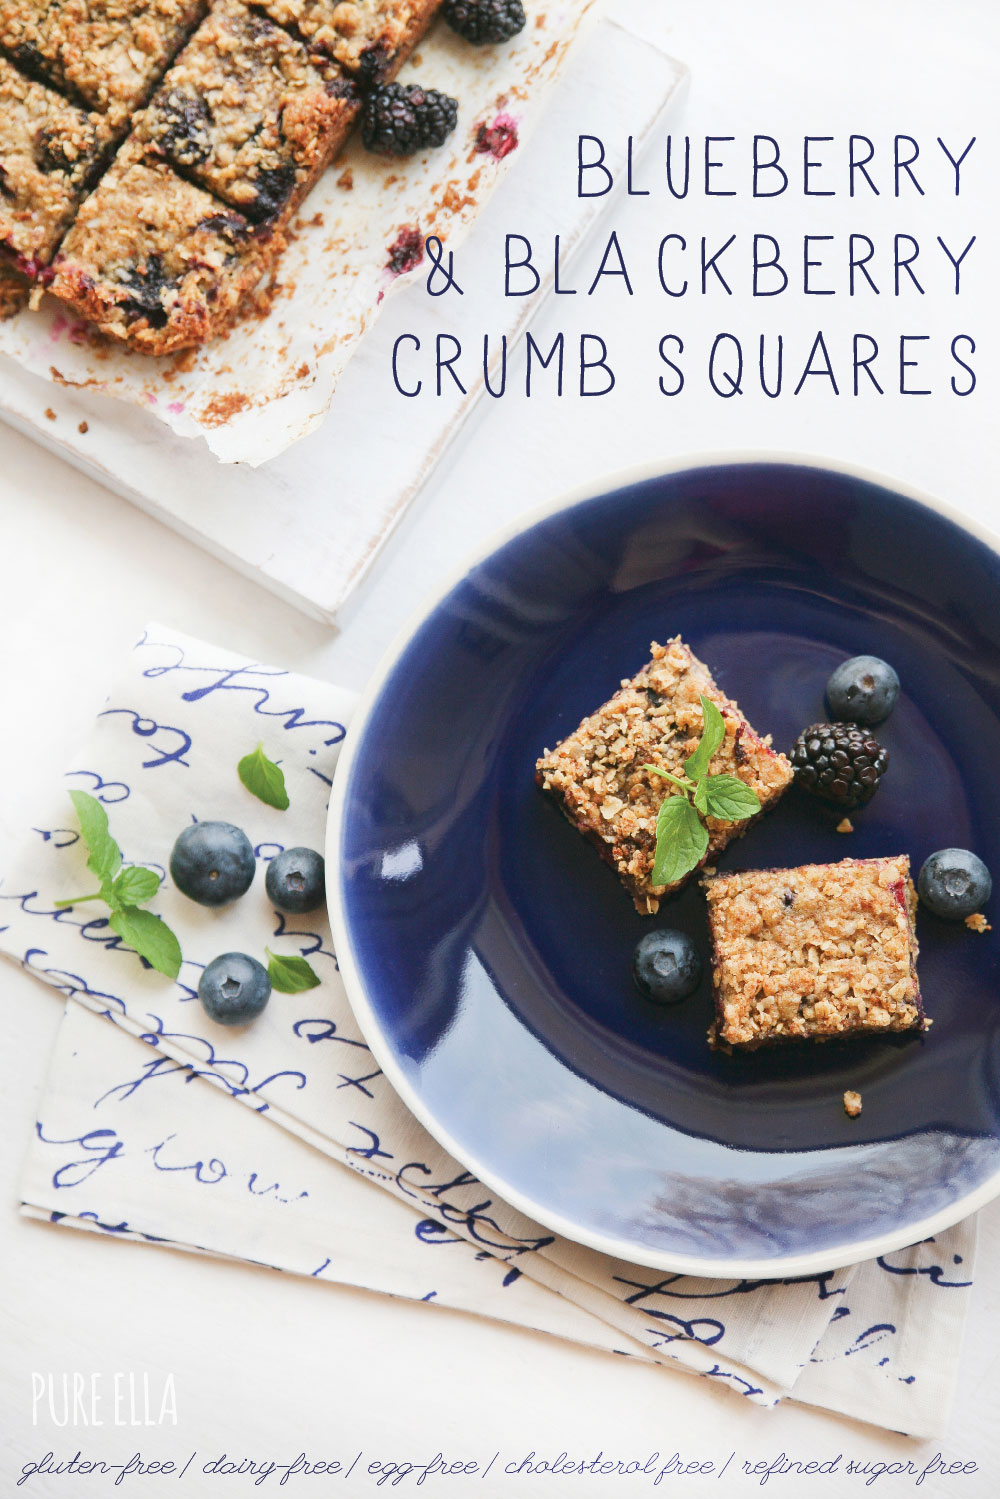 Pure-Ella-gluten-free-vegan-blueberry-blackberry-crumb-squares